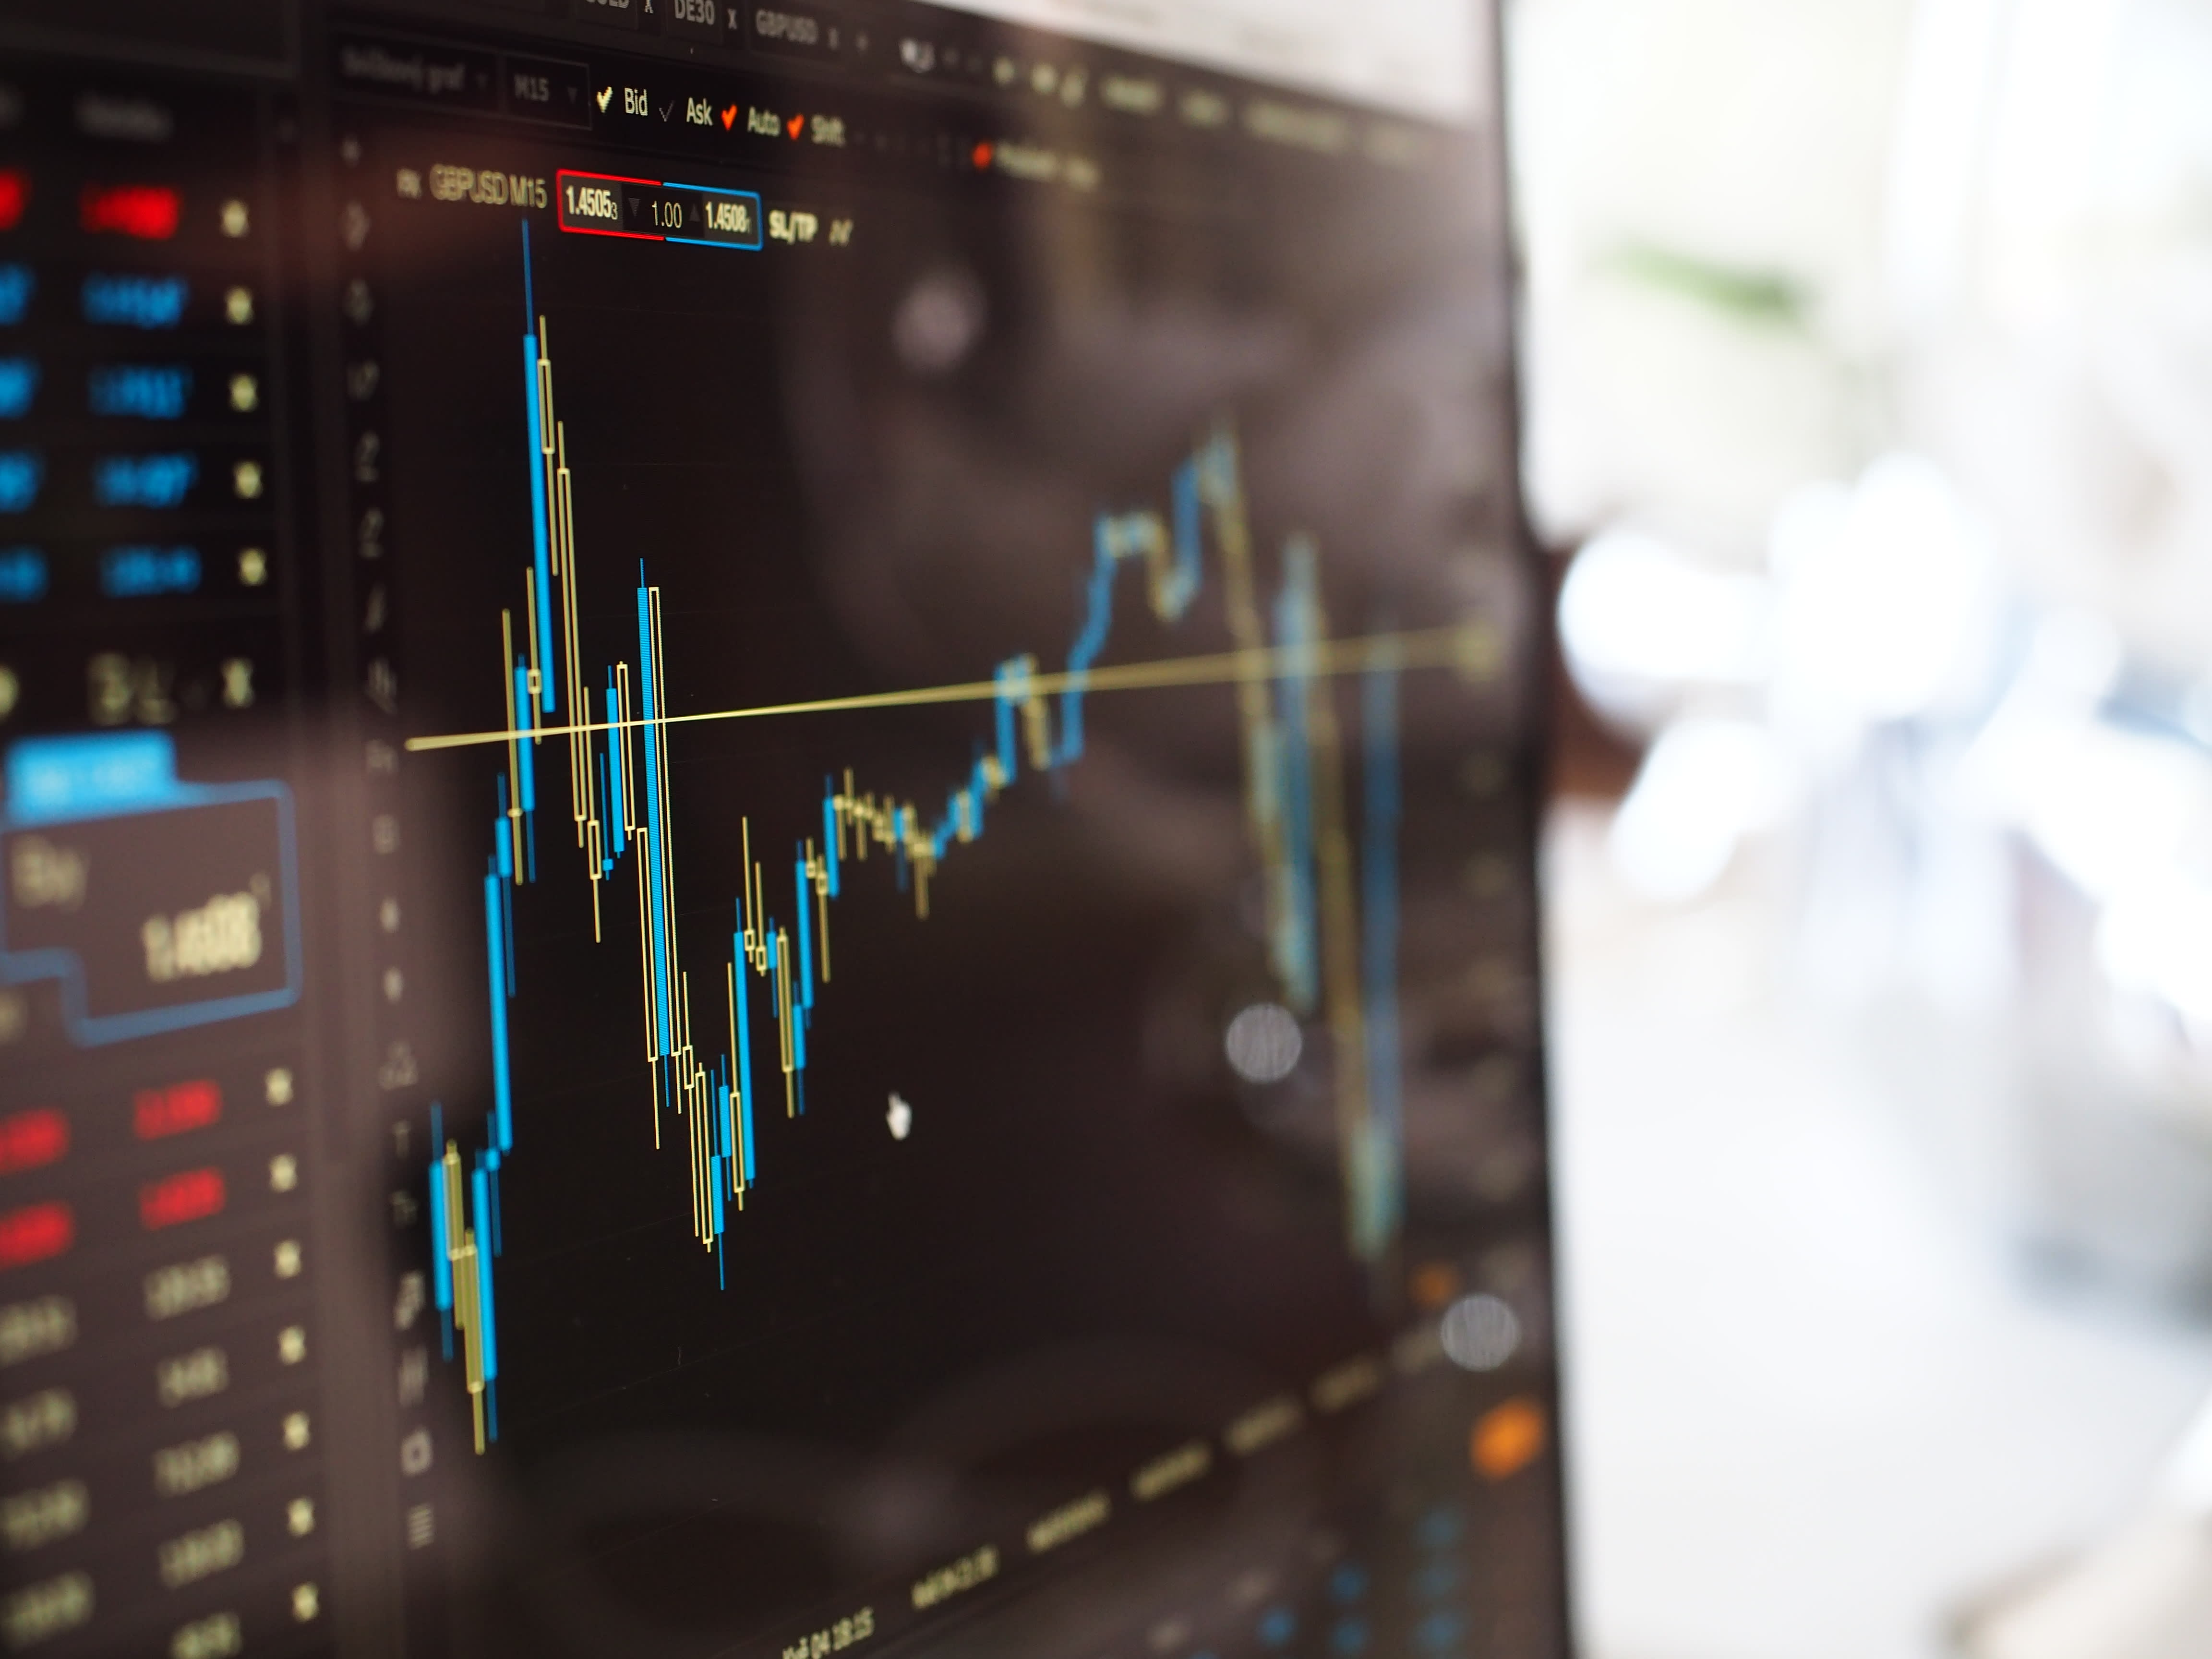 Advisers bring risk back as markets look skyward